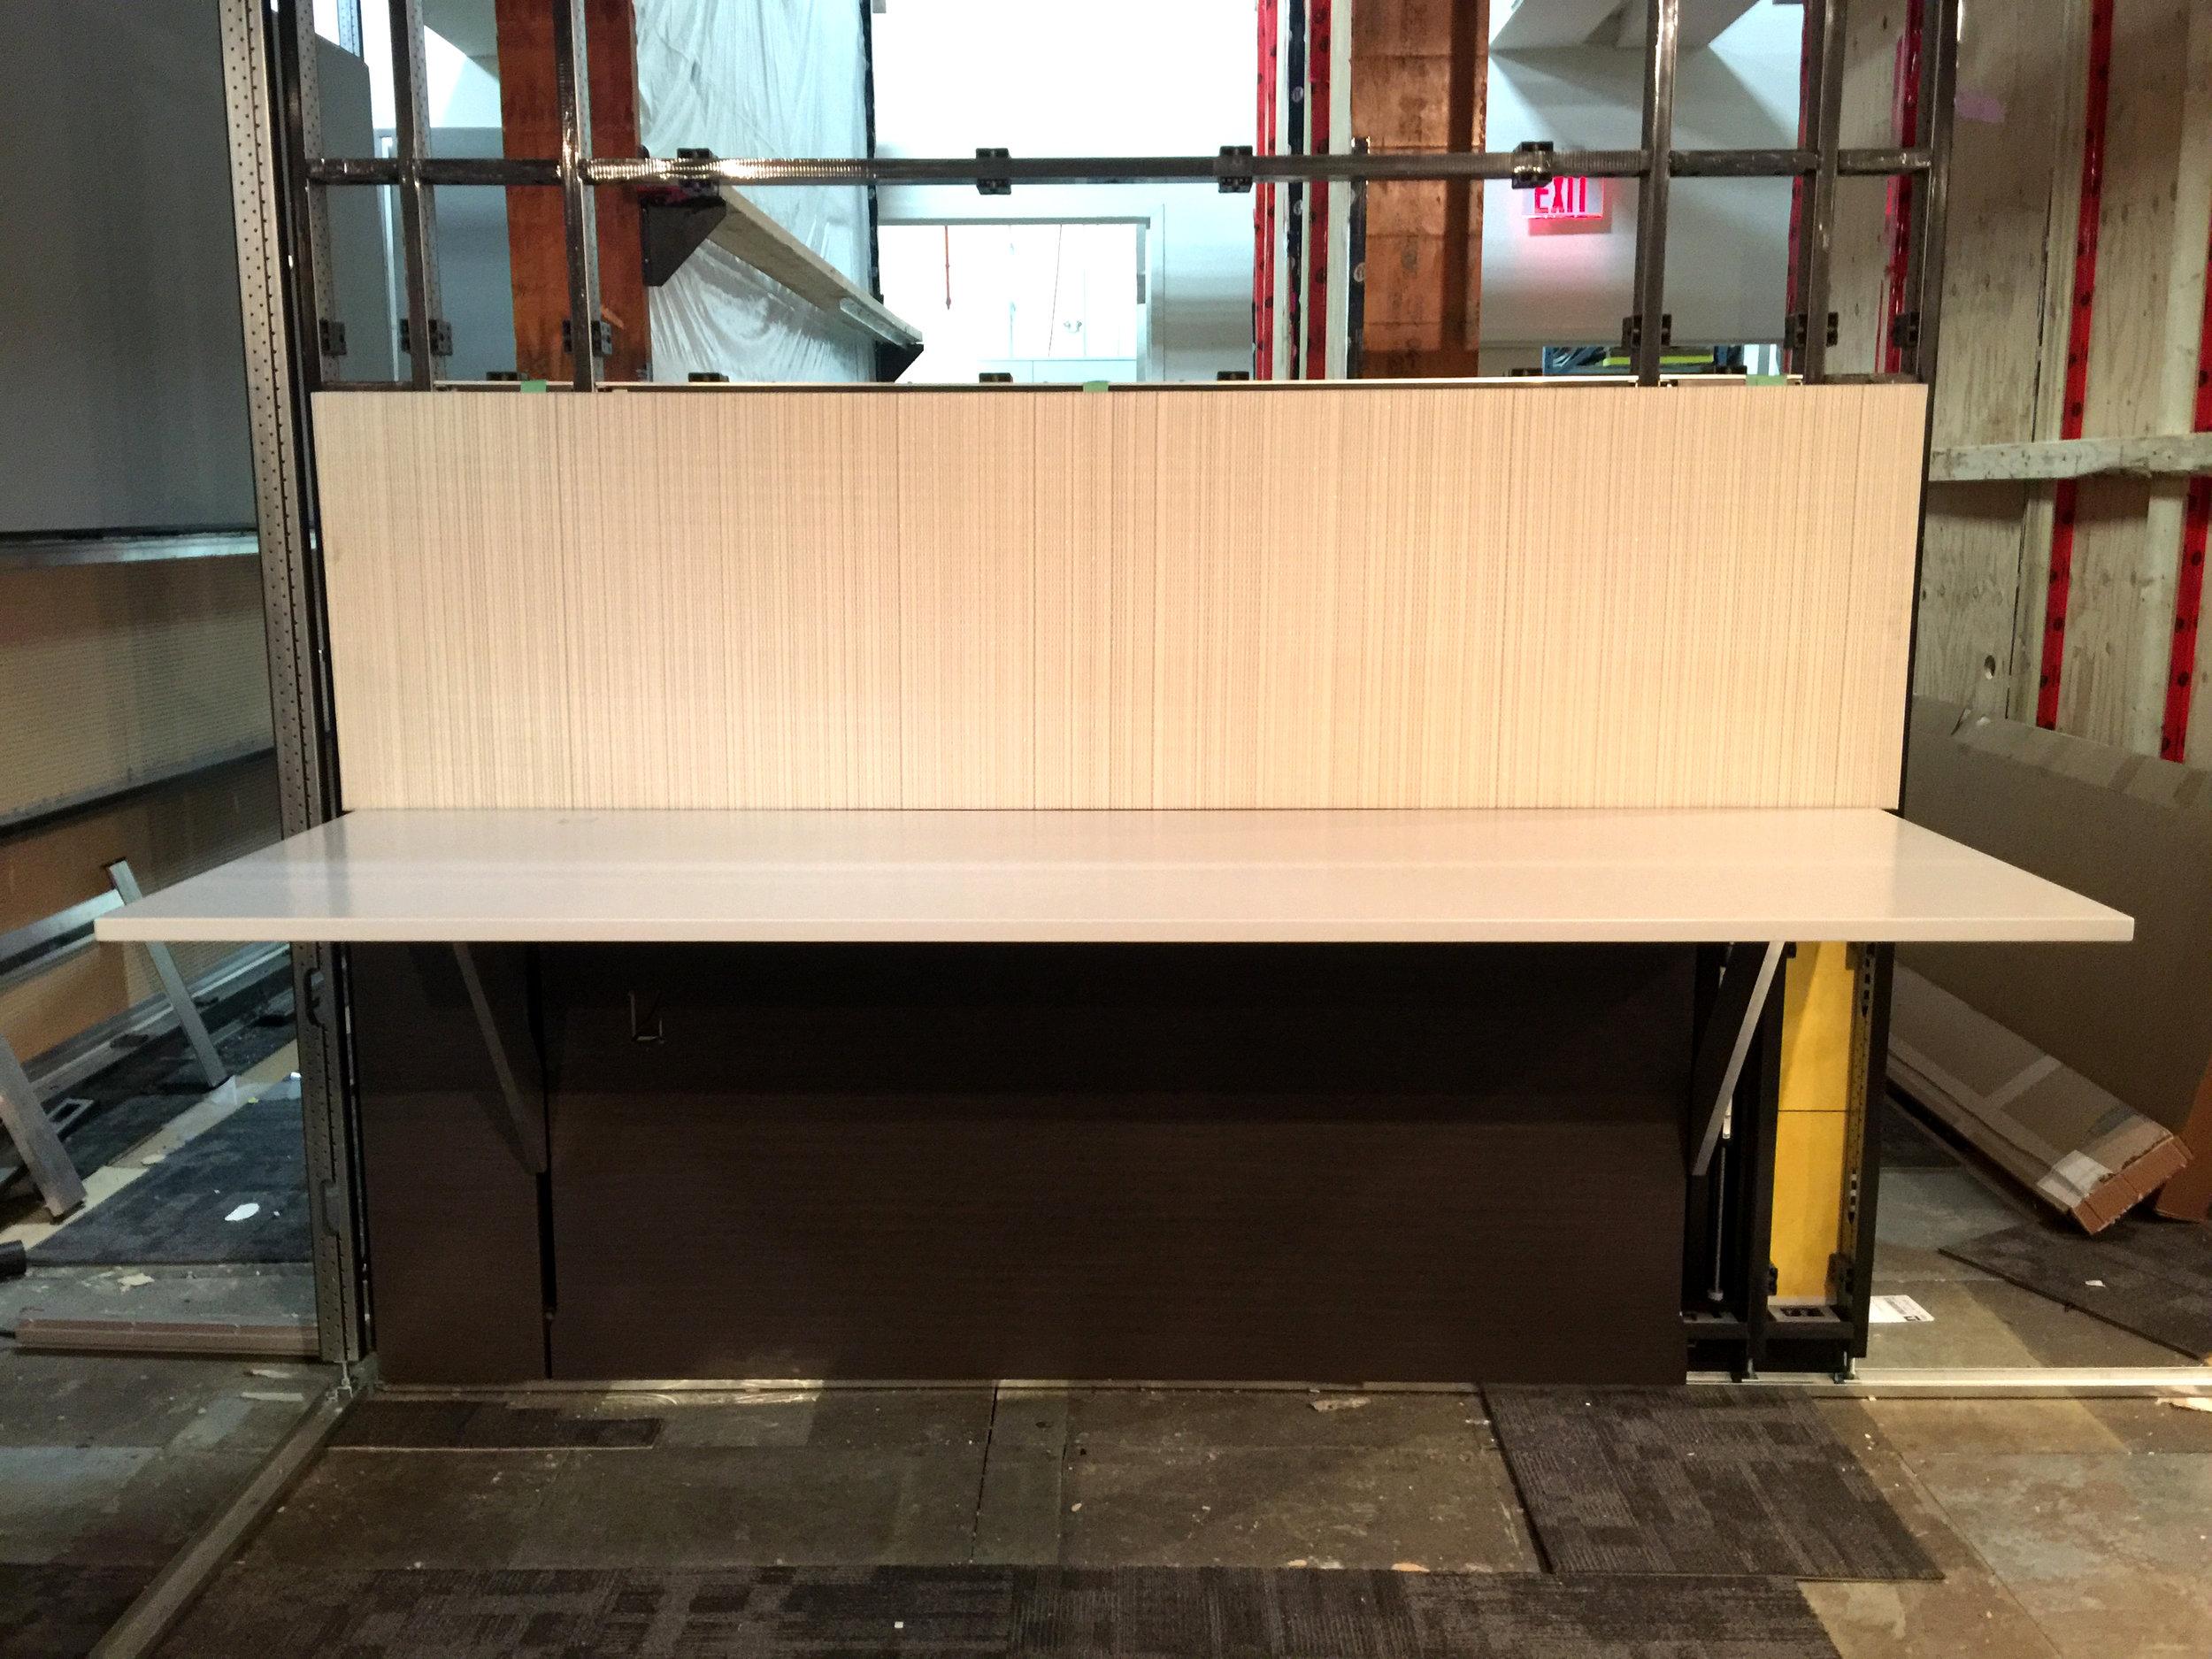 Prototype of Altos desk and hard fascias.